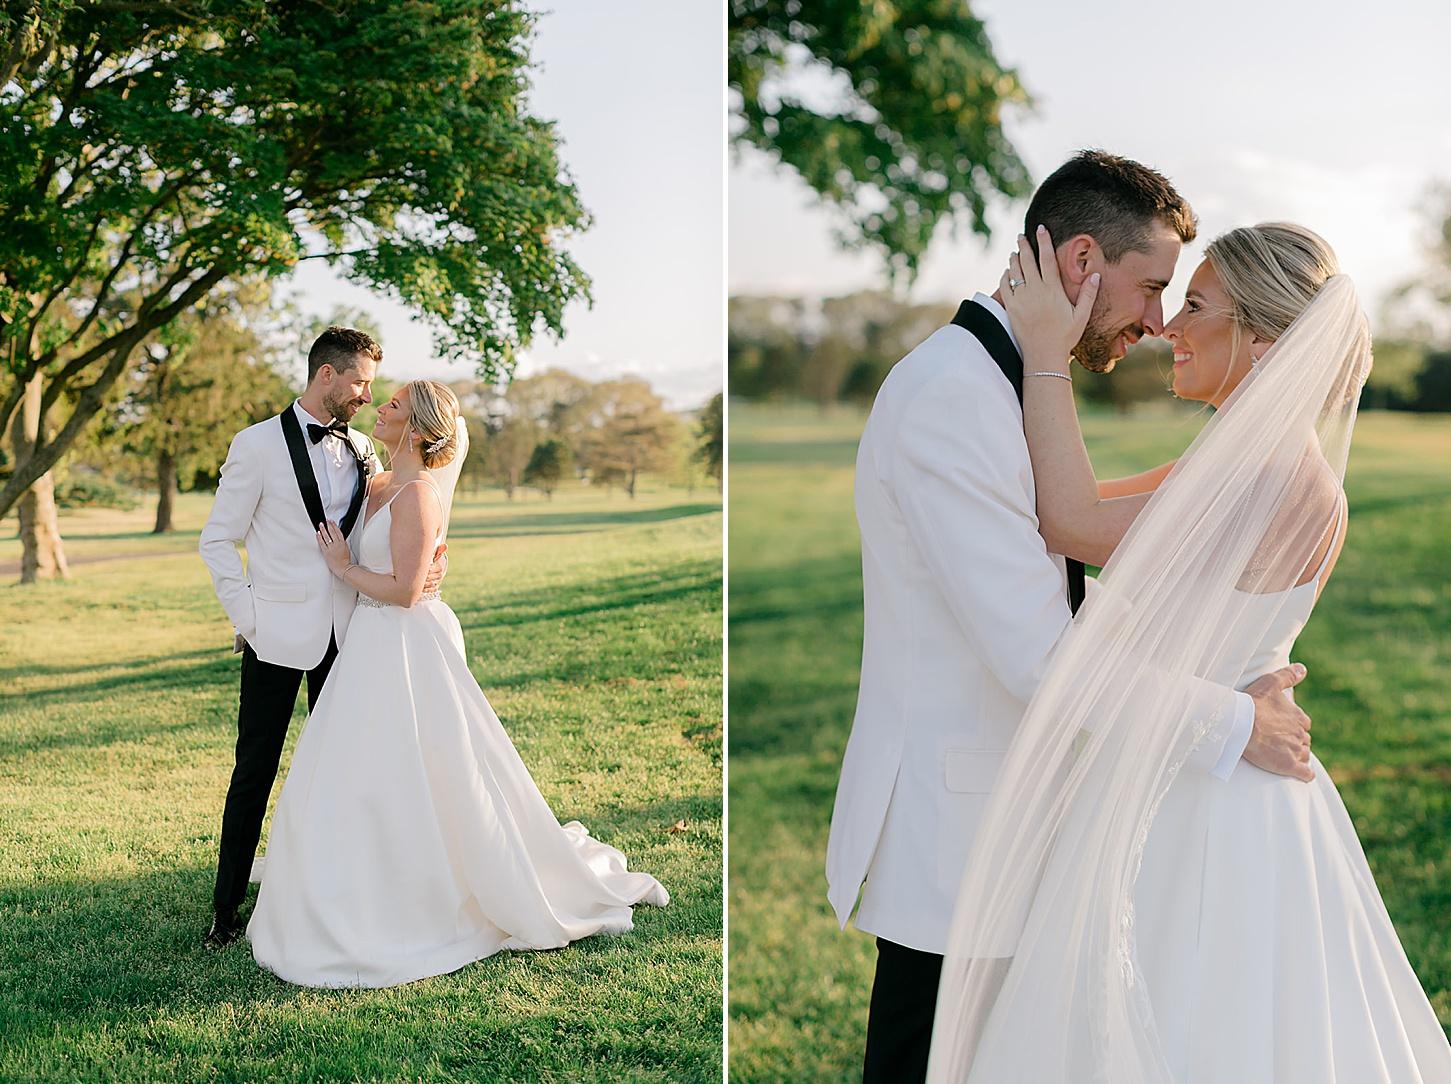 Linwood Country Club Summer Wedding Photography Studio by Magdalena Studios Jenn Kyle 0046